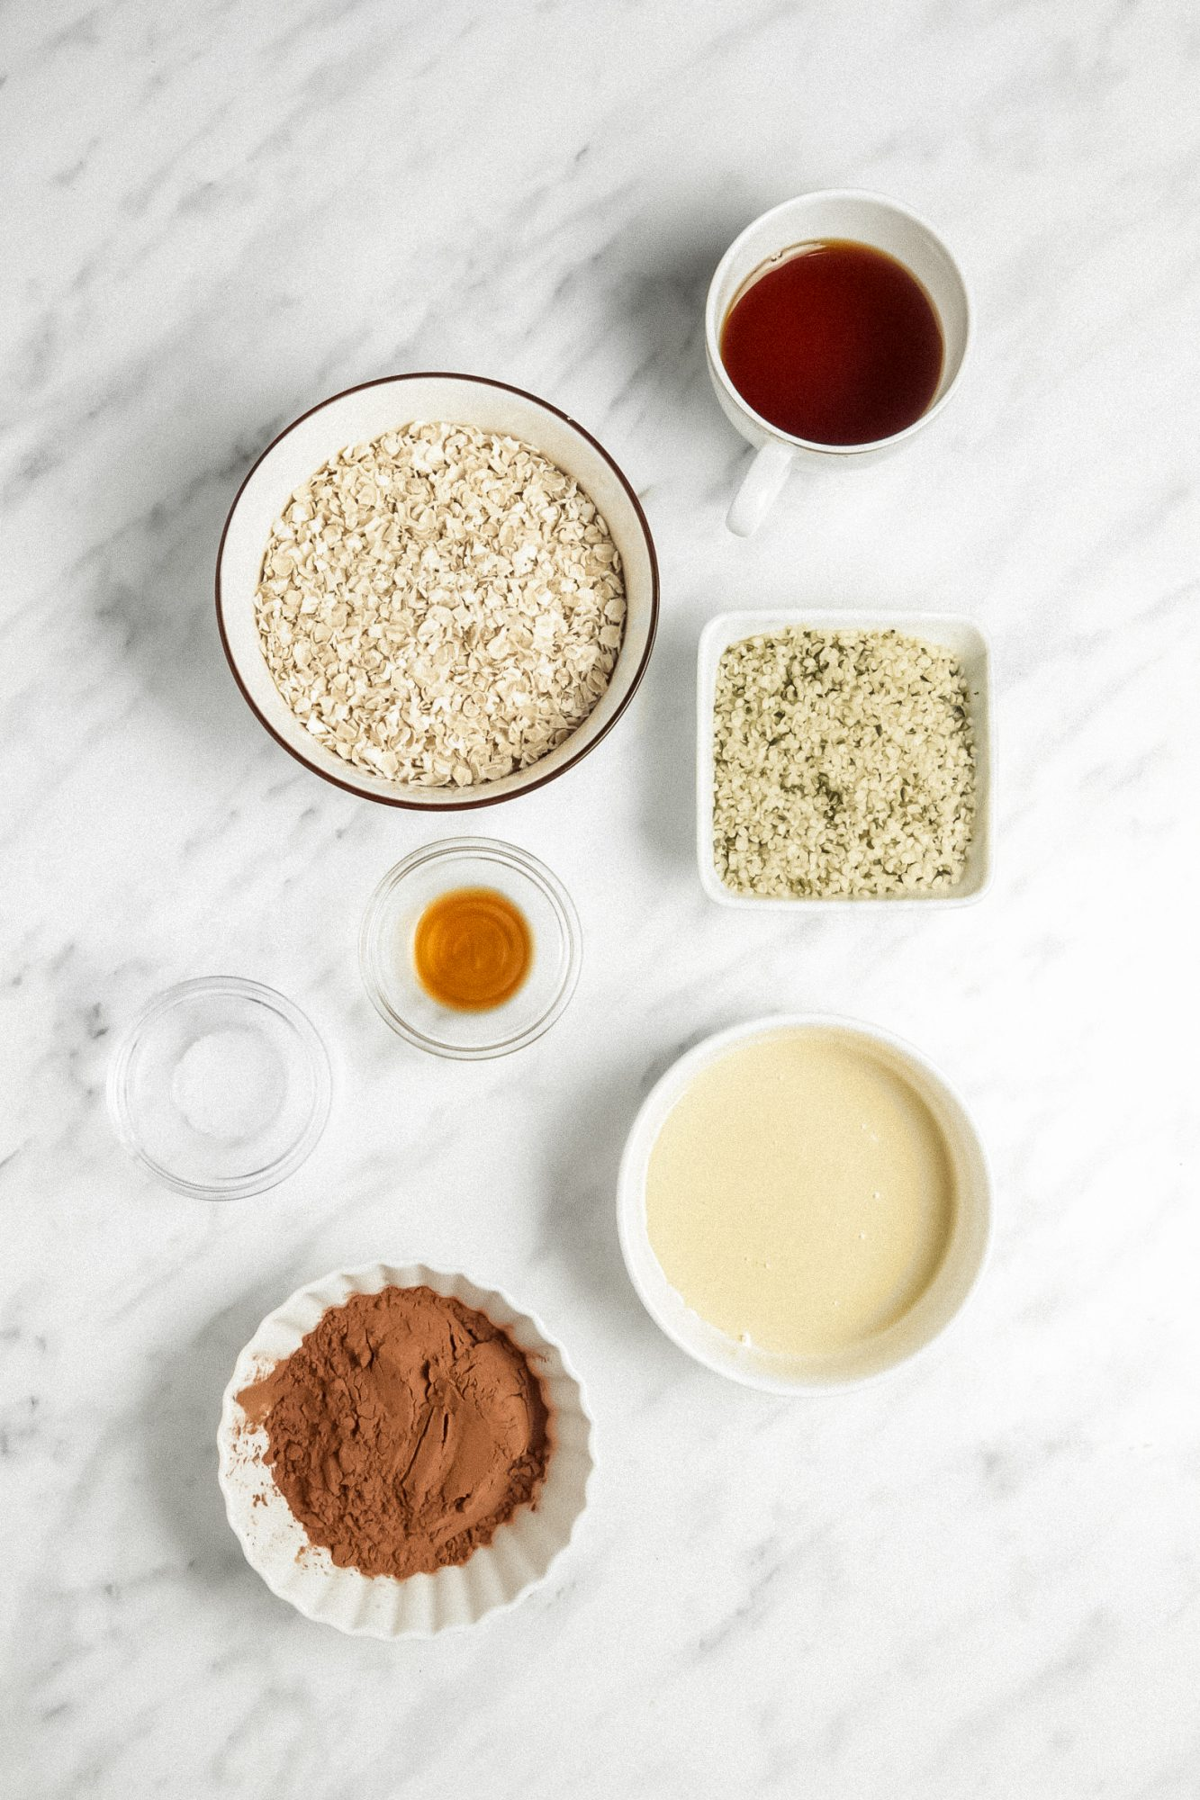 Ingredients for Fudgy Hemp Bites